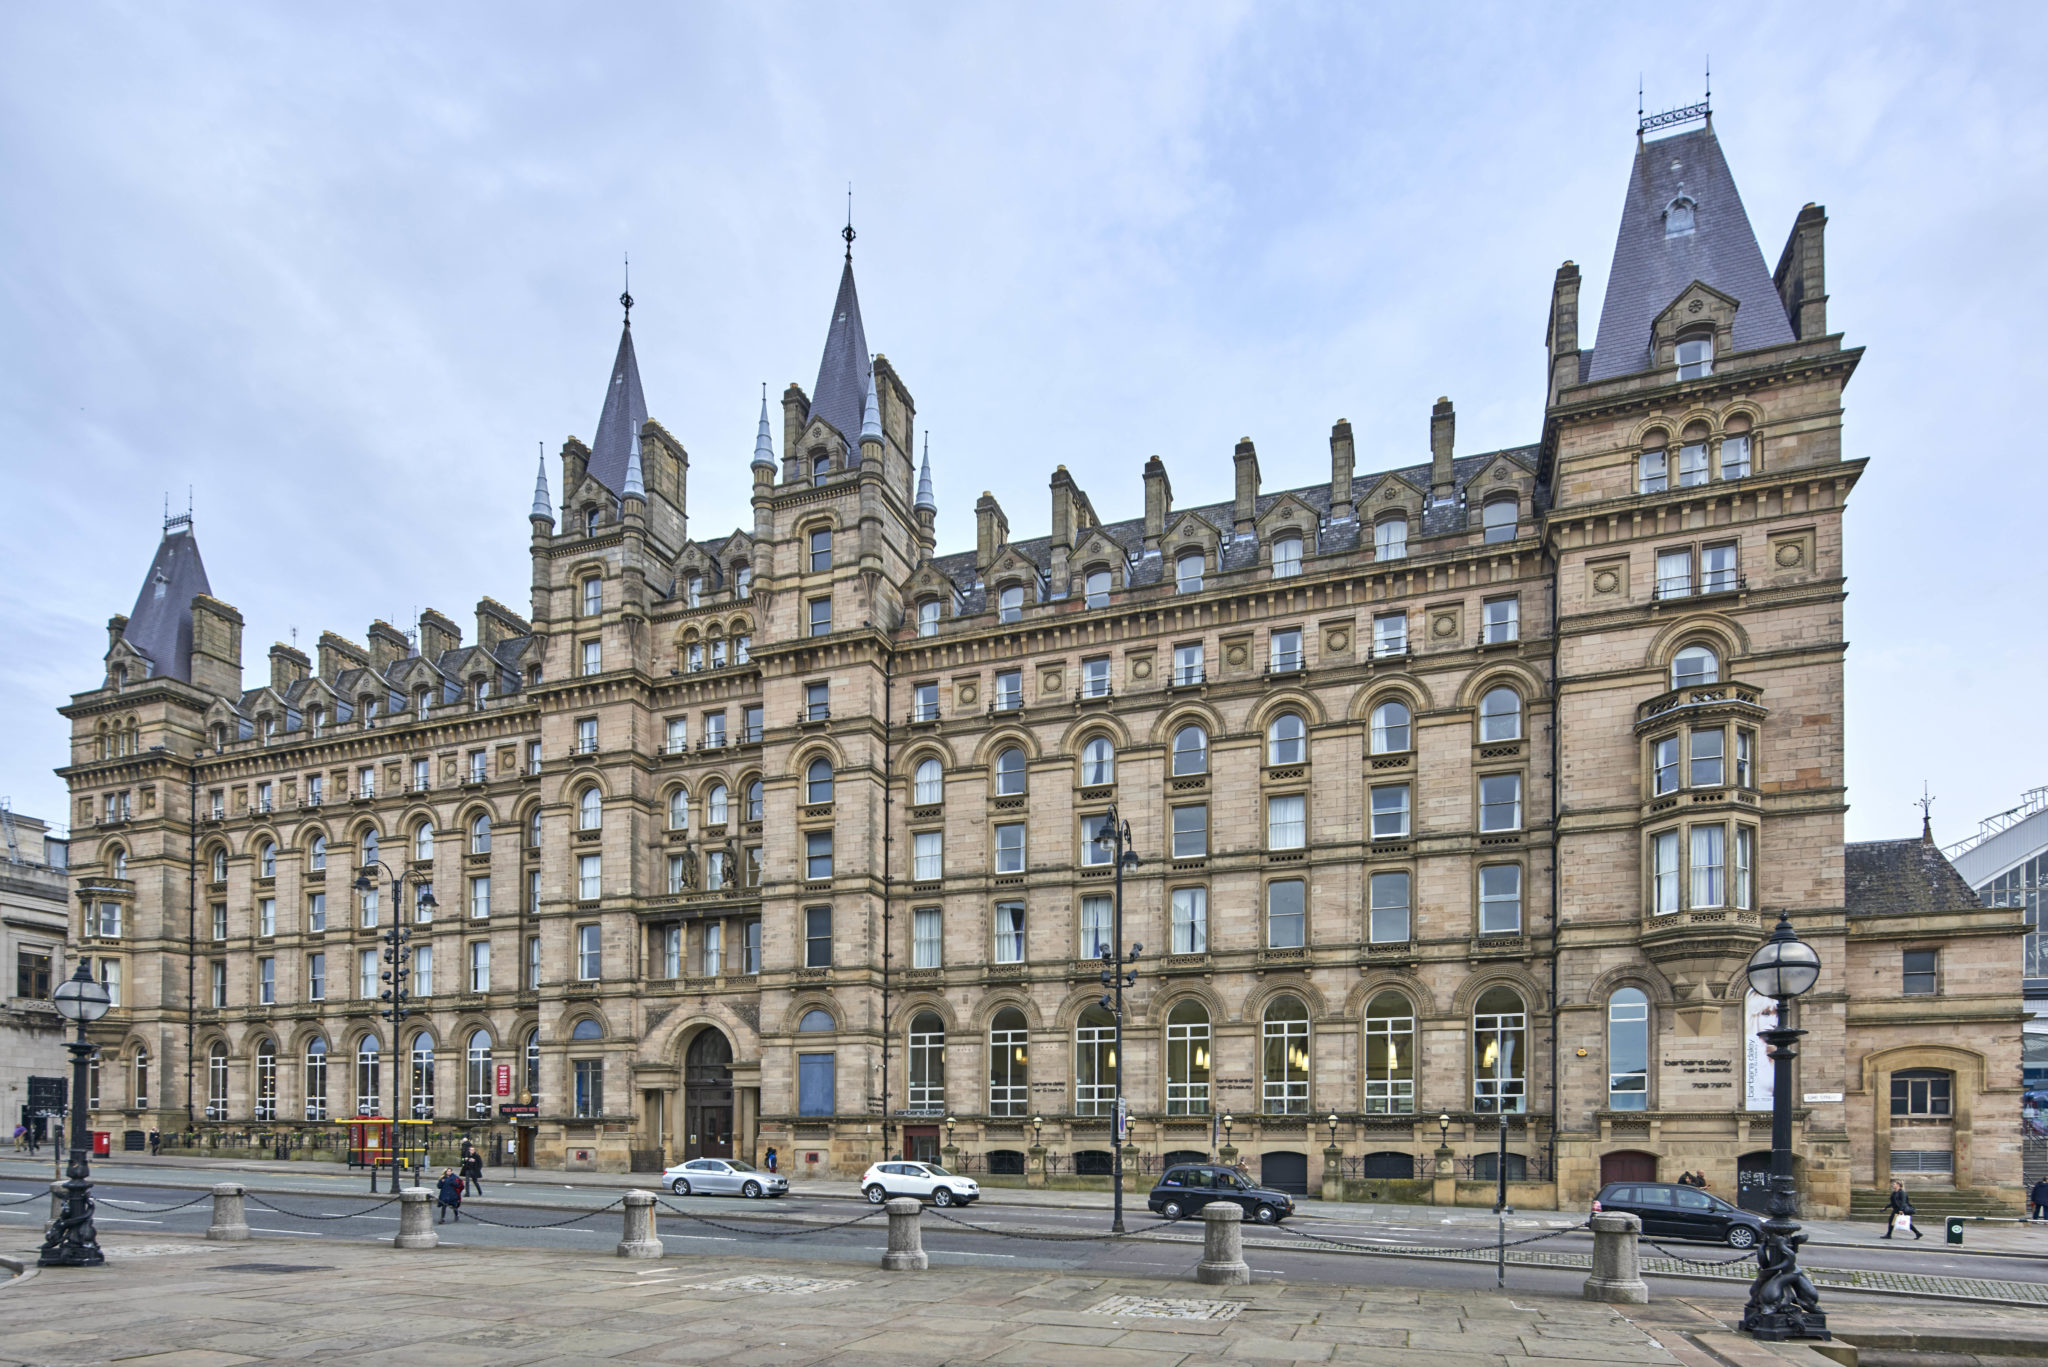 North Western Hall Liverpool exterior